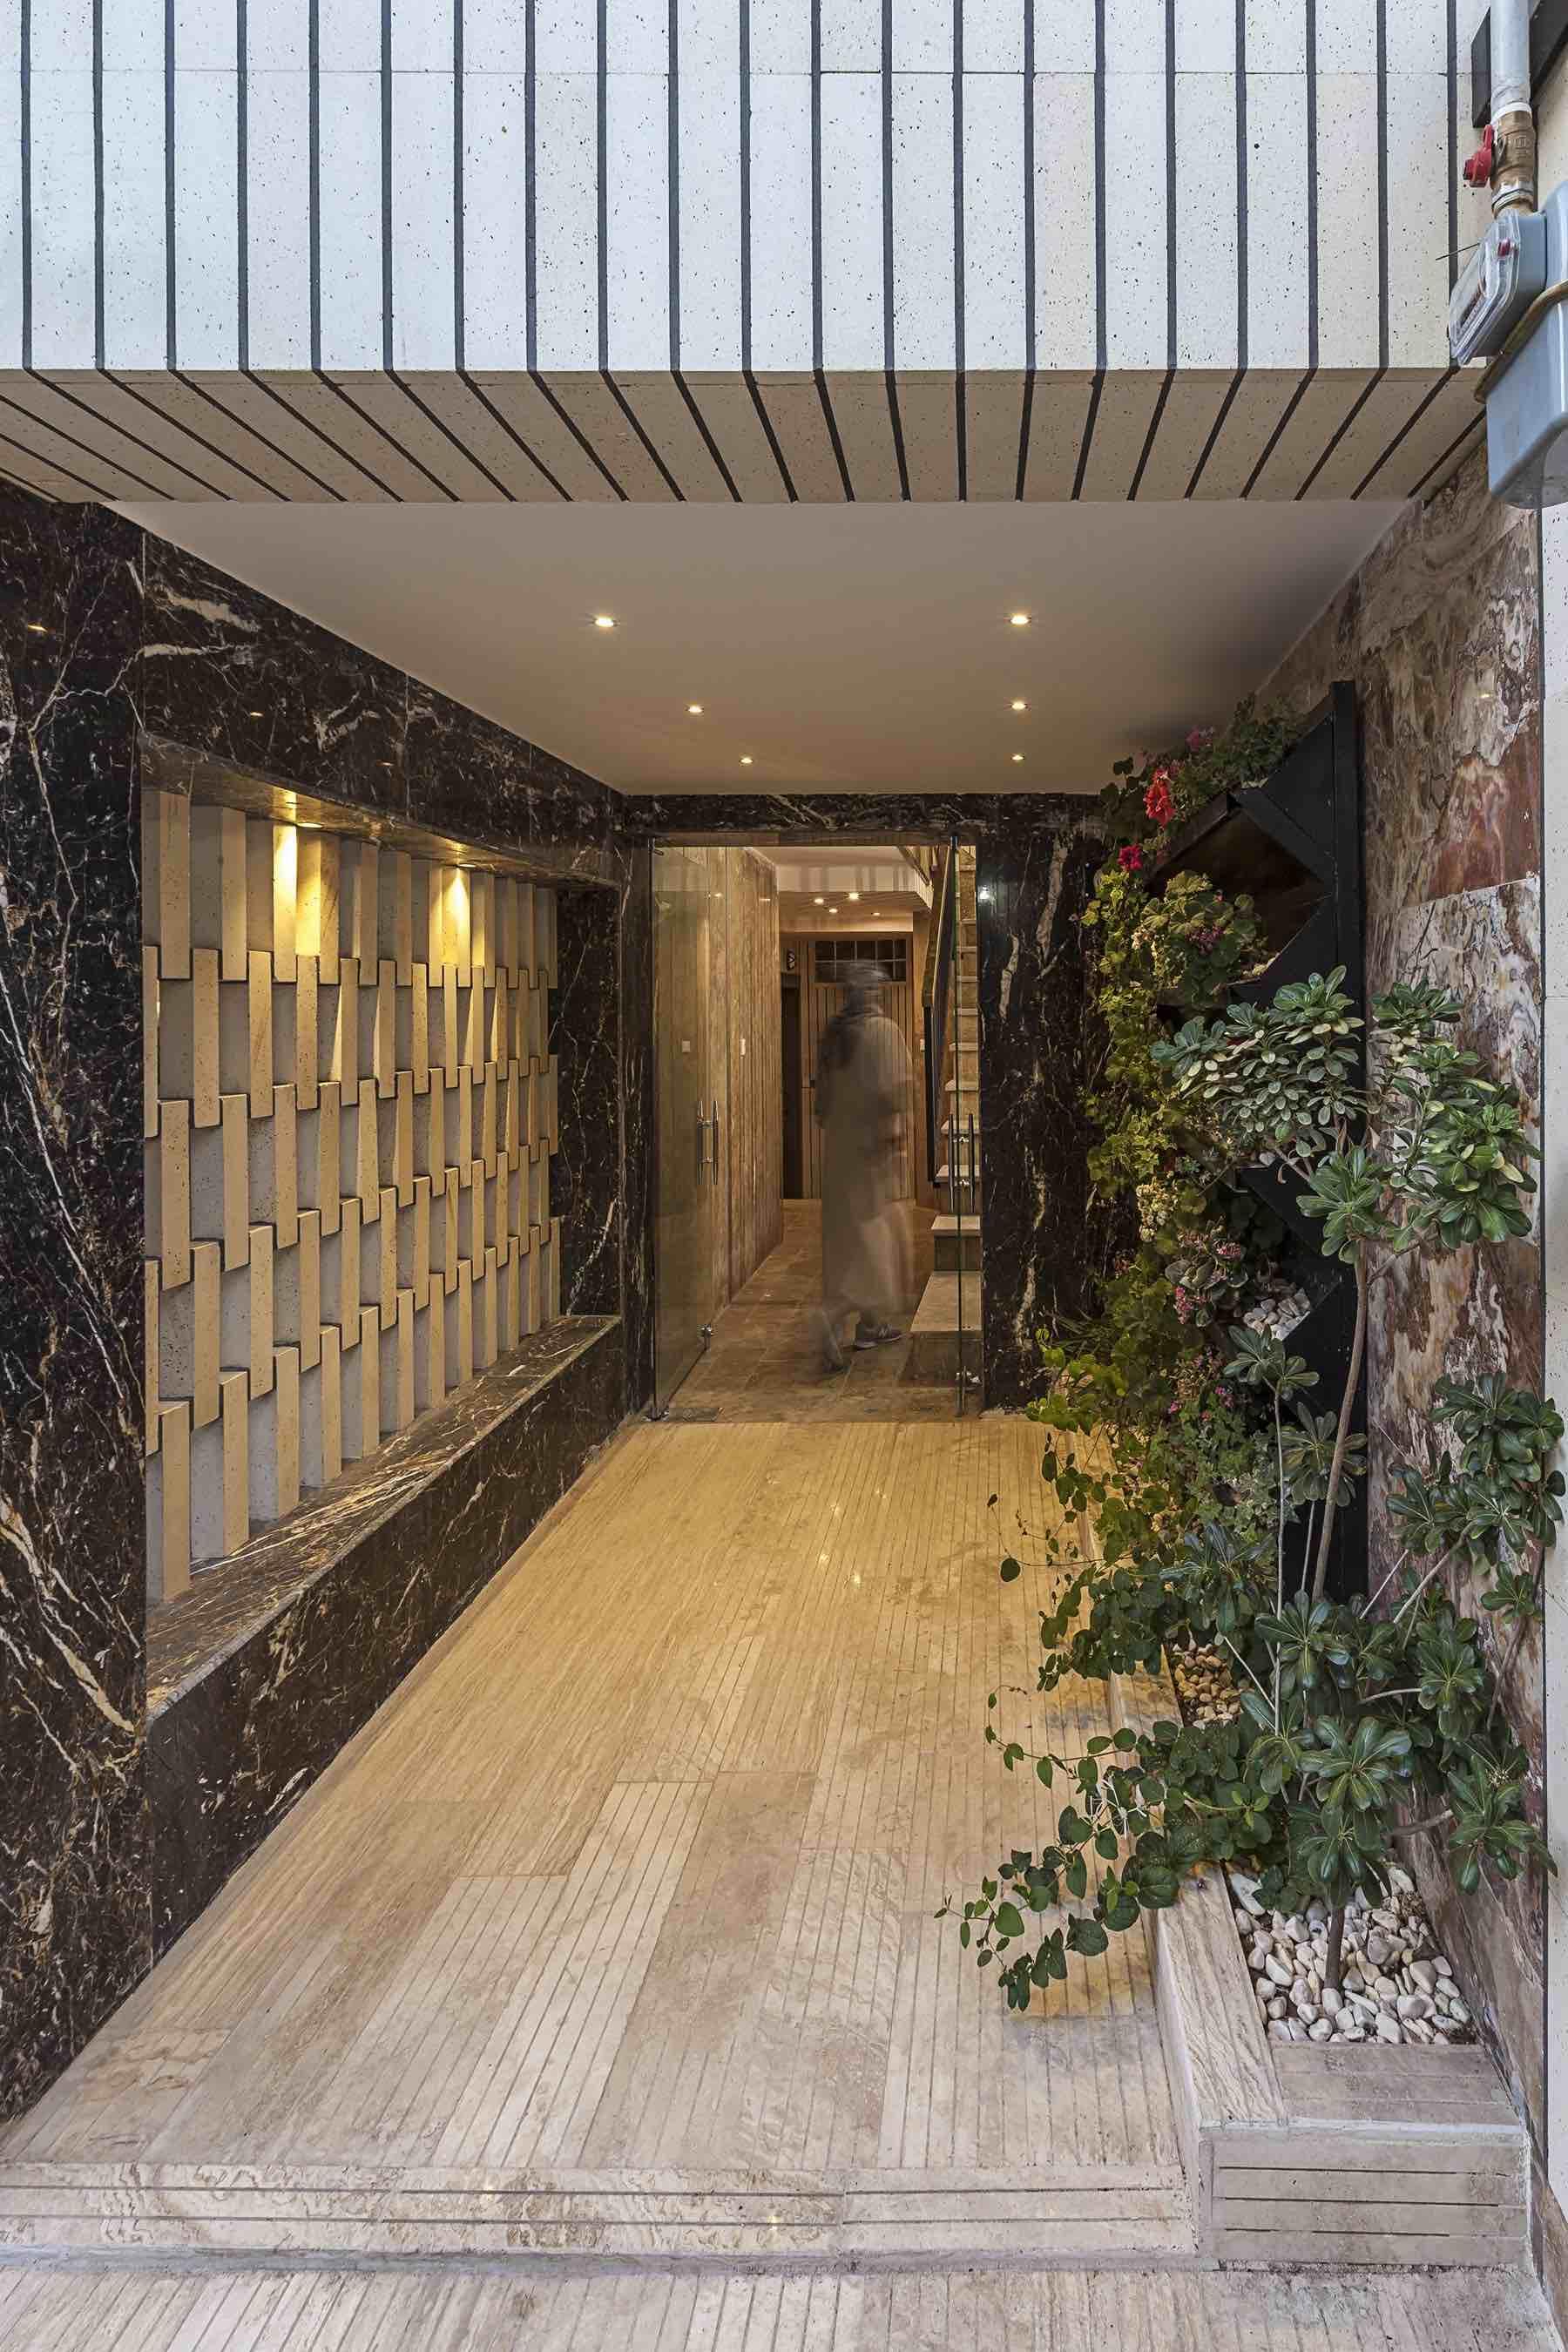 Rouzan_Residential_Building_Sayed_hamed_jafari_Charchoob_Architecture_Office_007.jpg